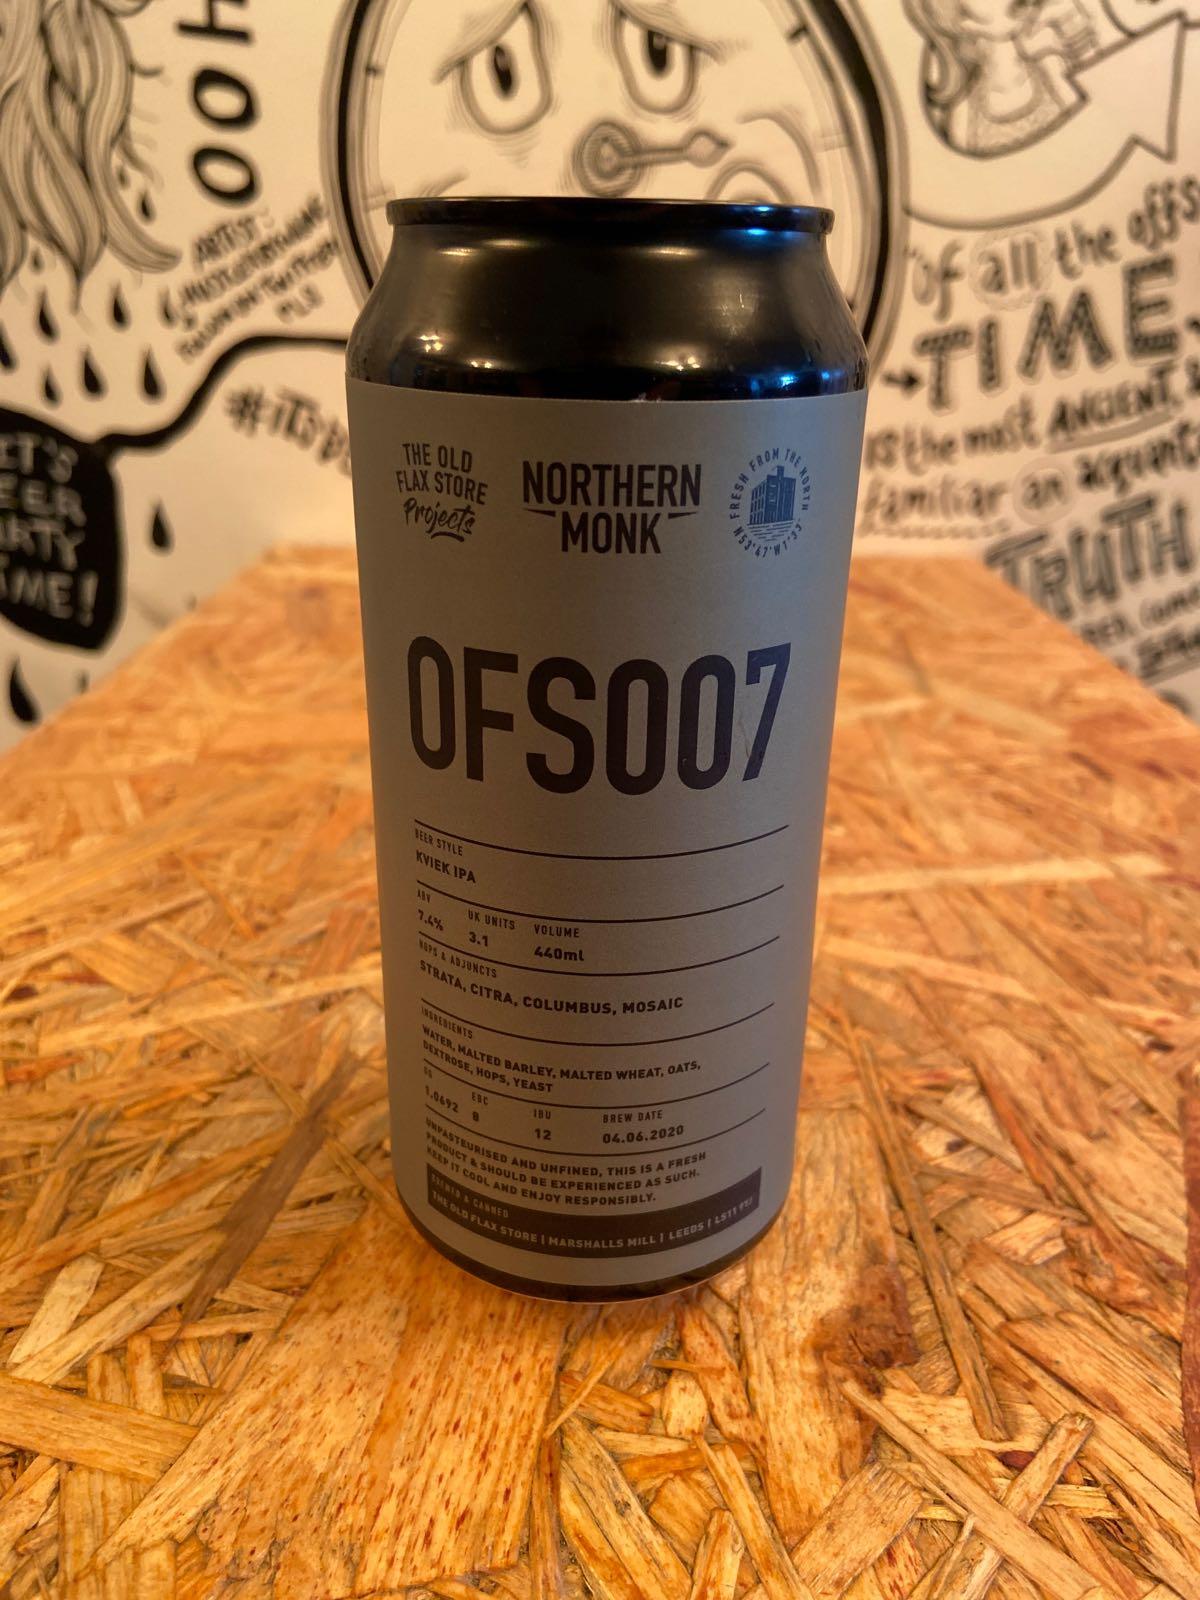 Northern Monk OFS007 Kveik IPA 7.4%